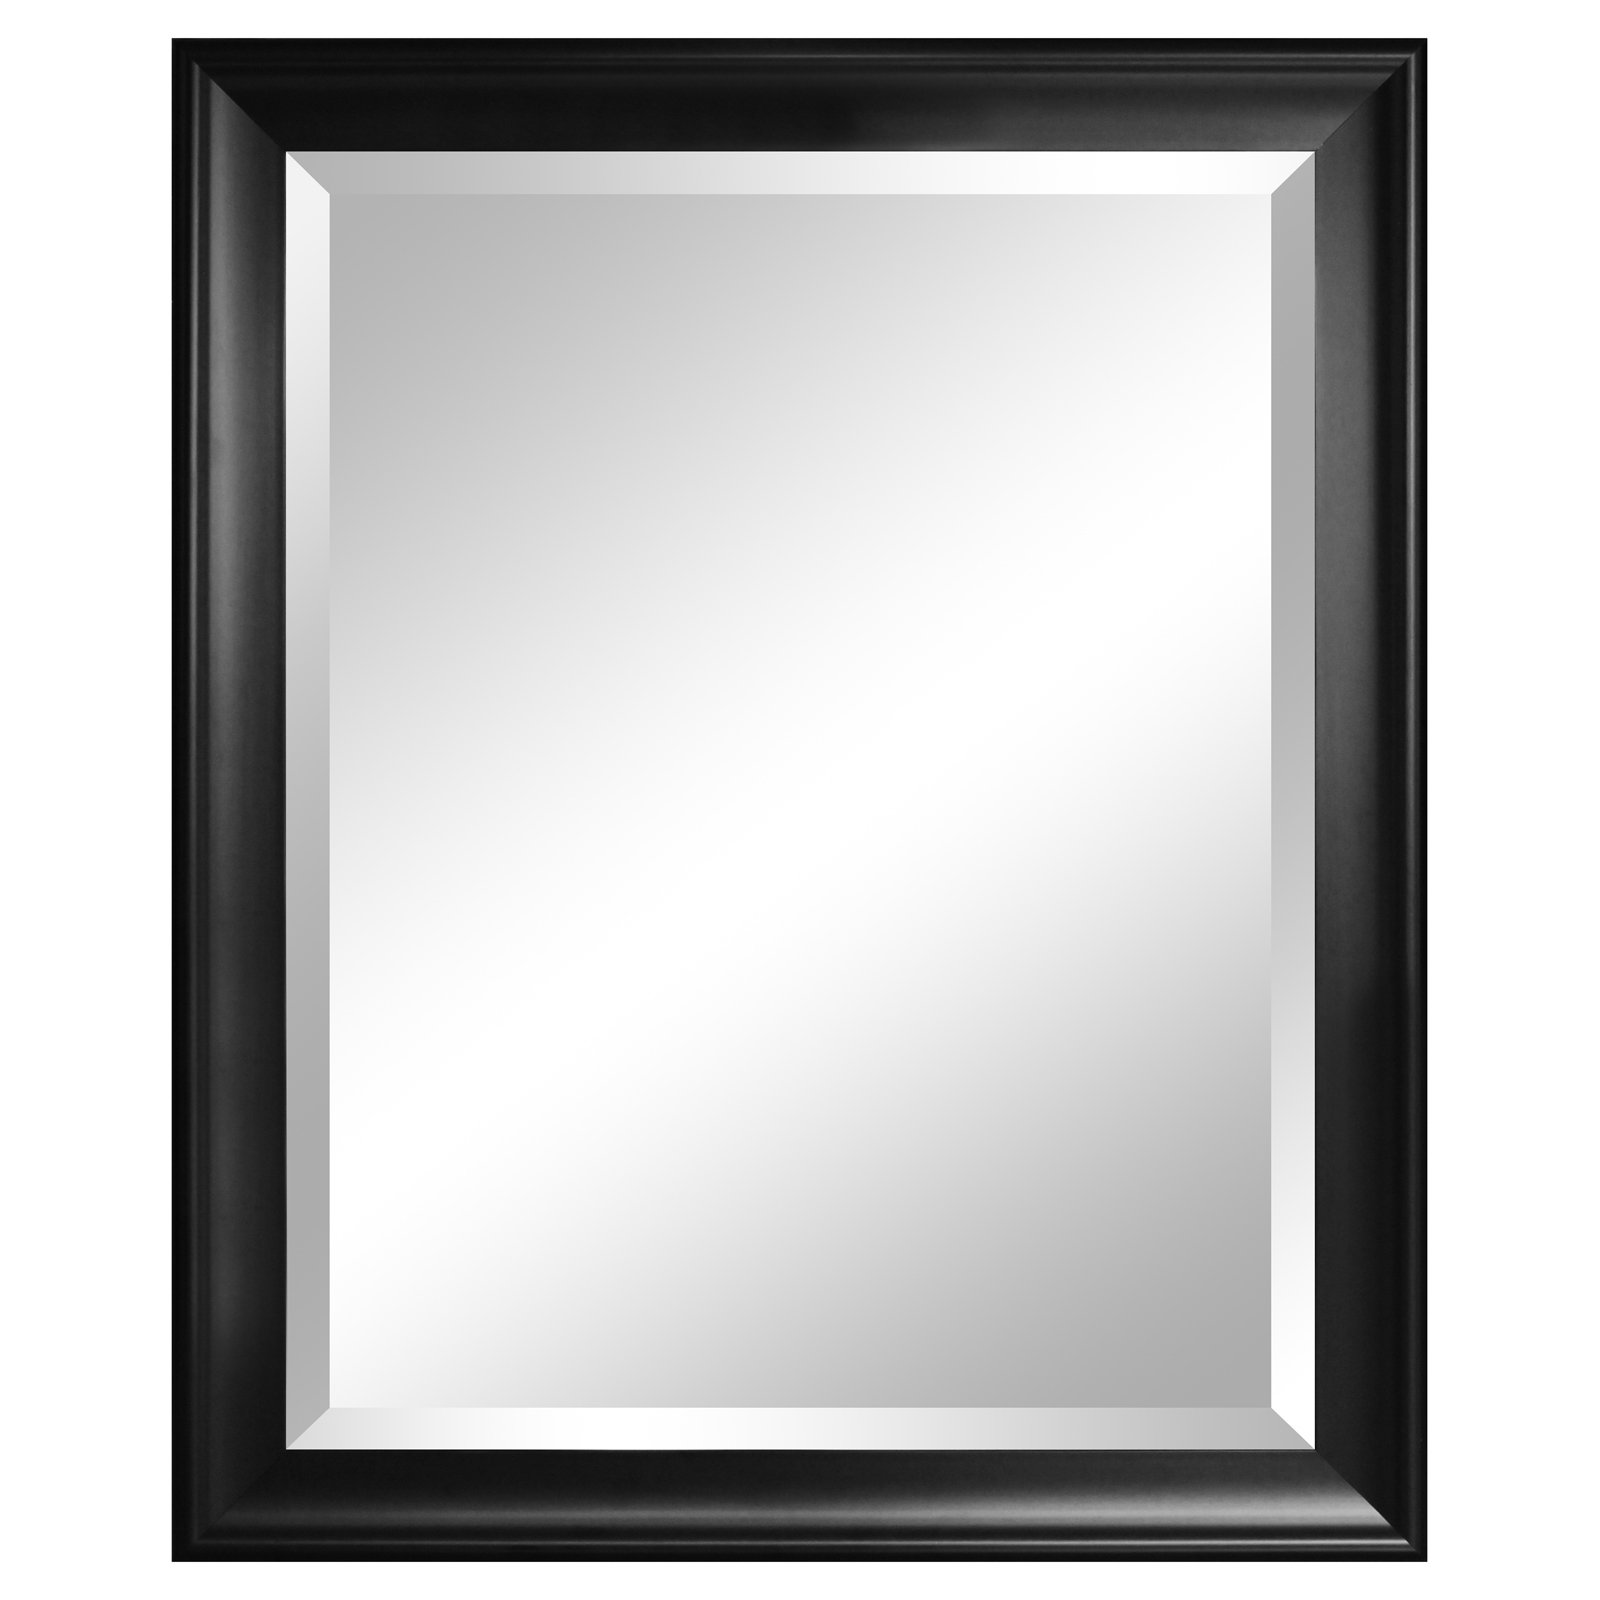 Symphony Black Beveled Wall Mirror - 28W x 34H in.